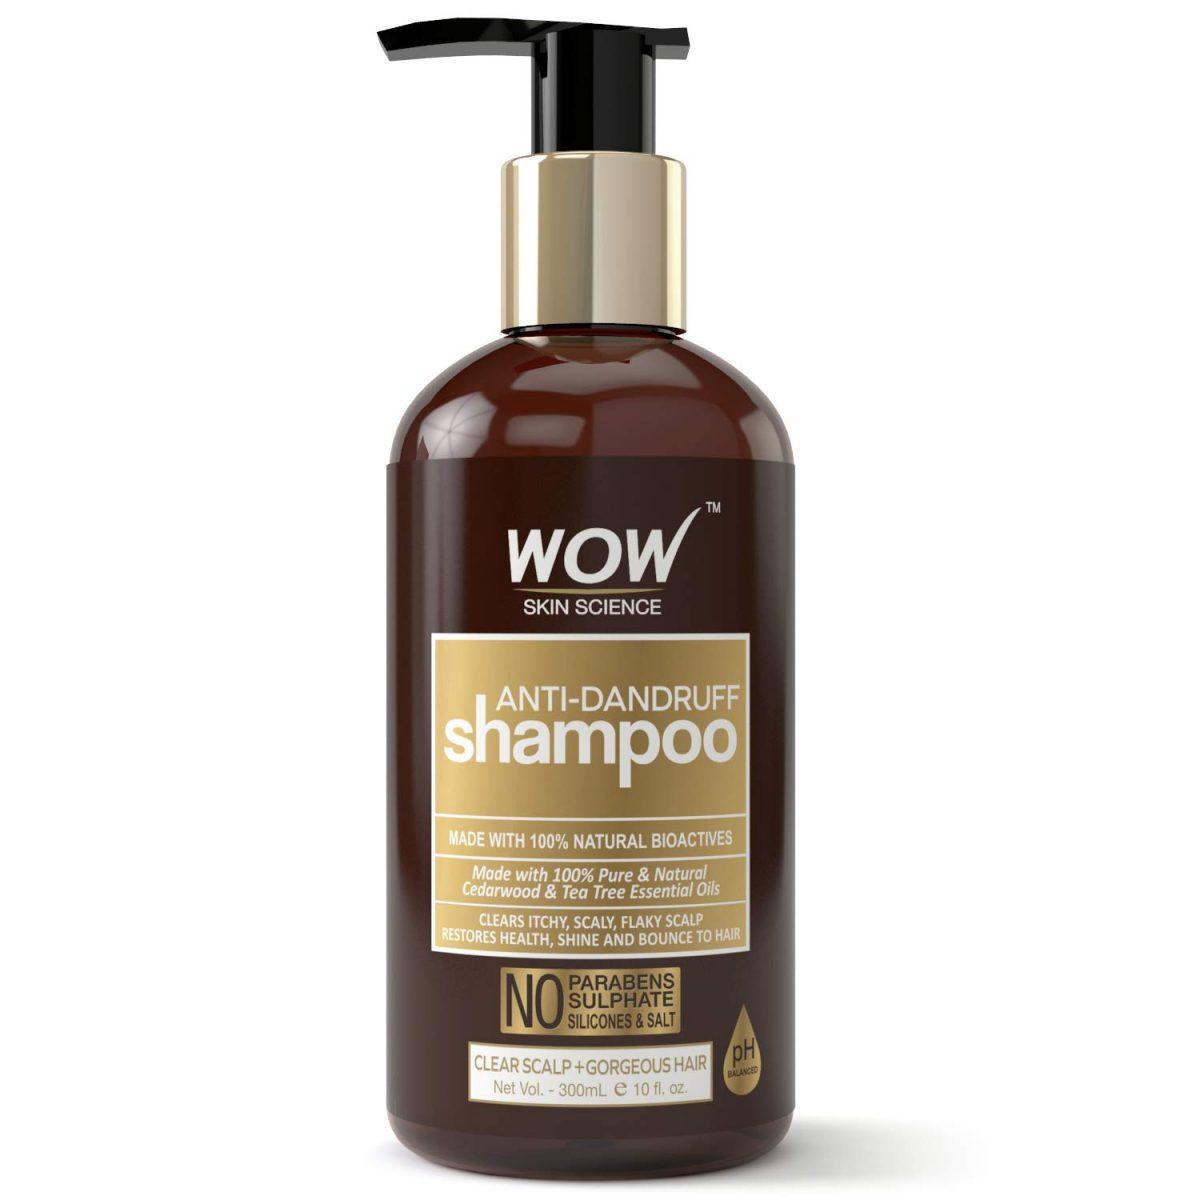 WOW Anti Dandruff Shampoo (300ml)